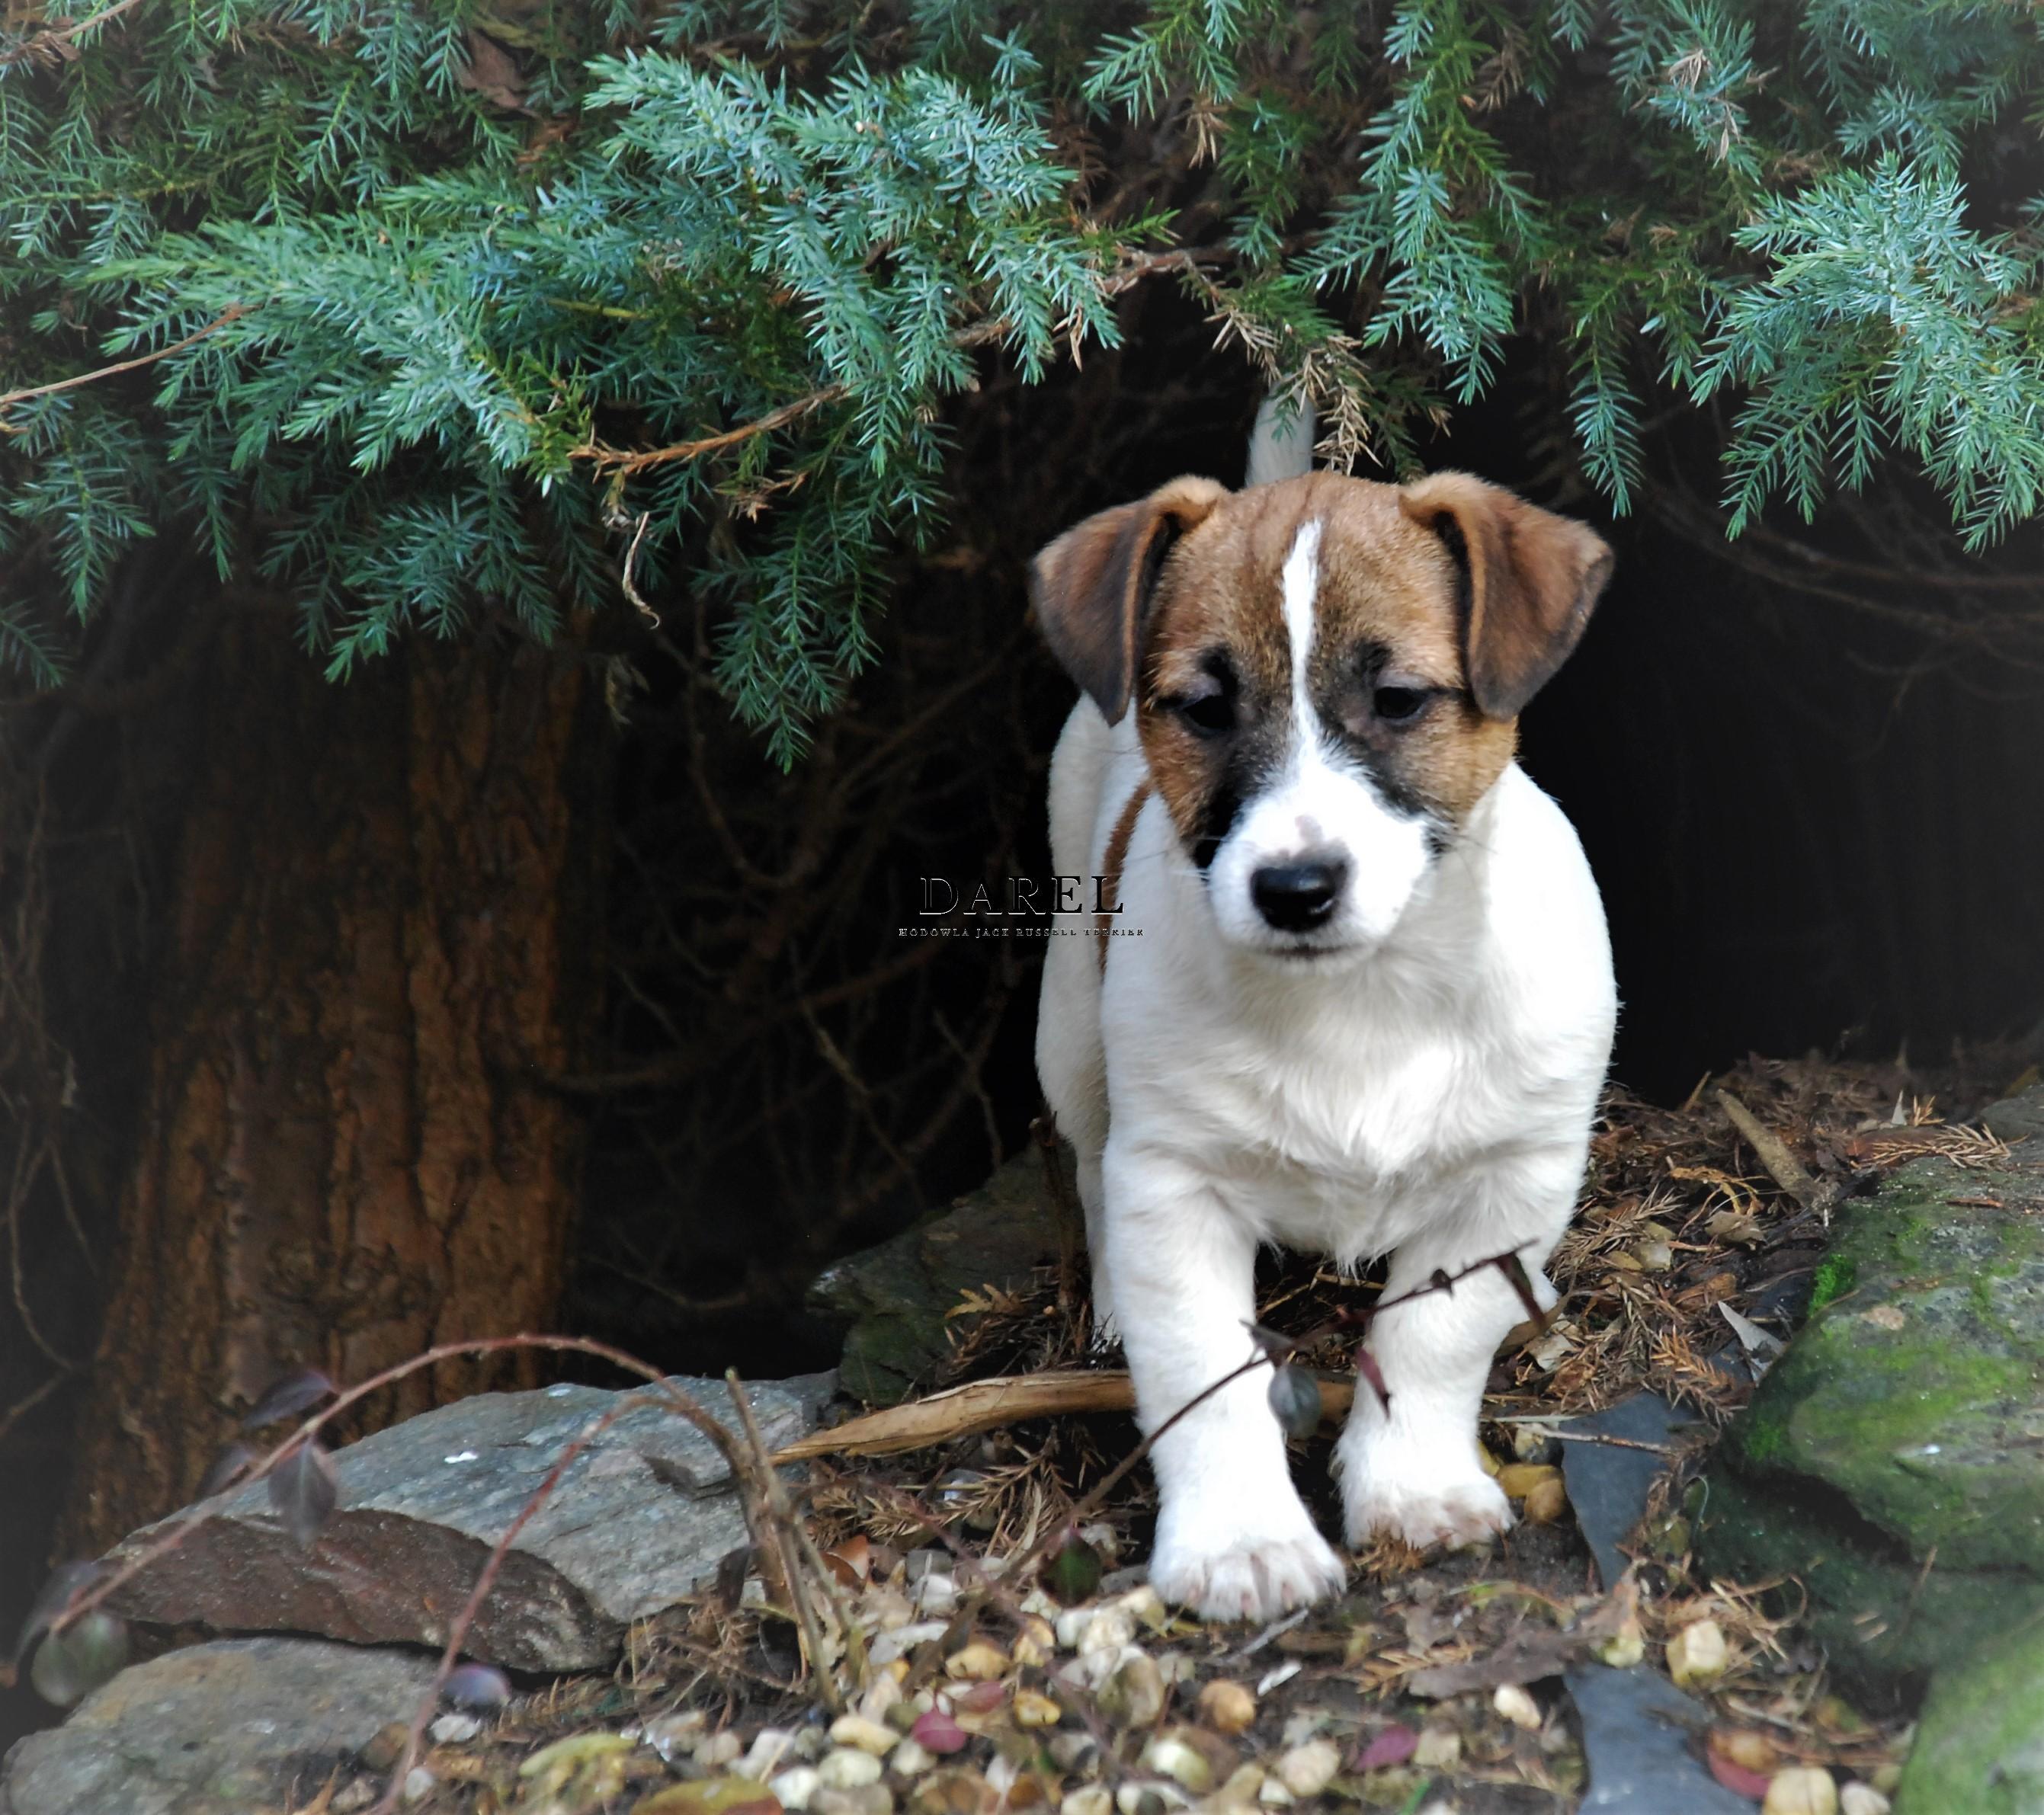 DEMI | DAREL Hodowla jack russell terrier JRT